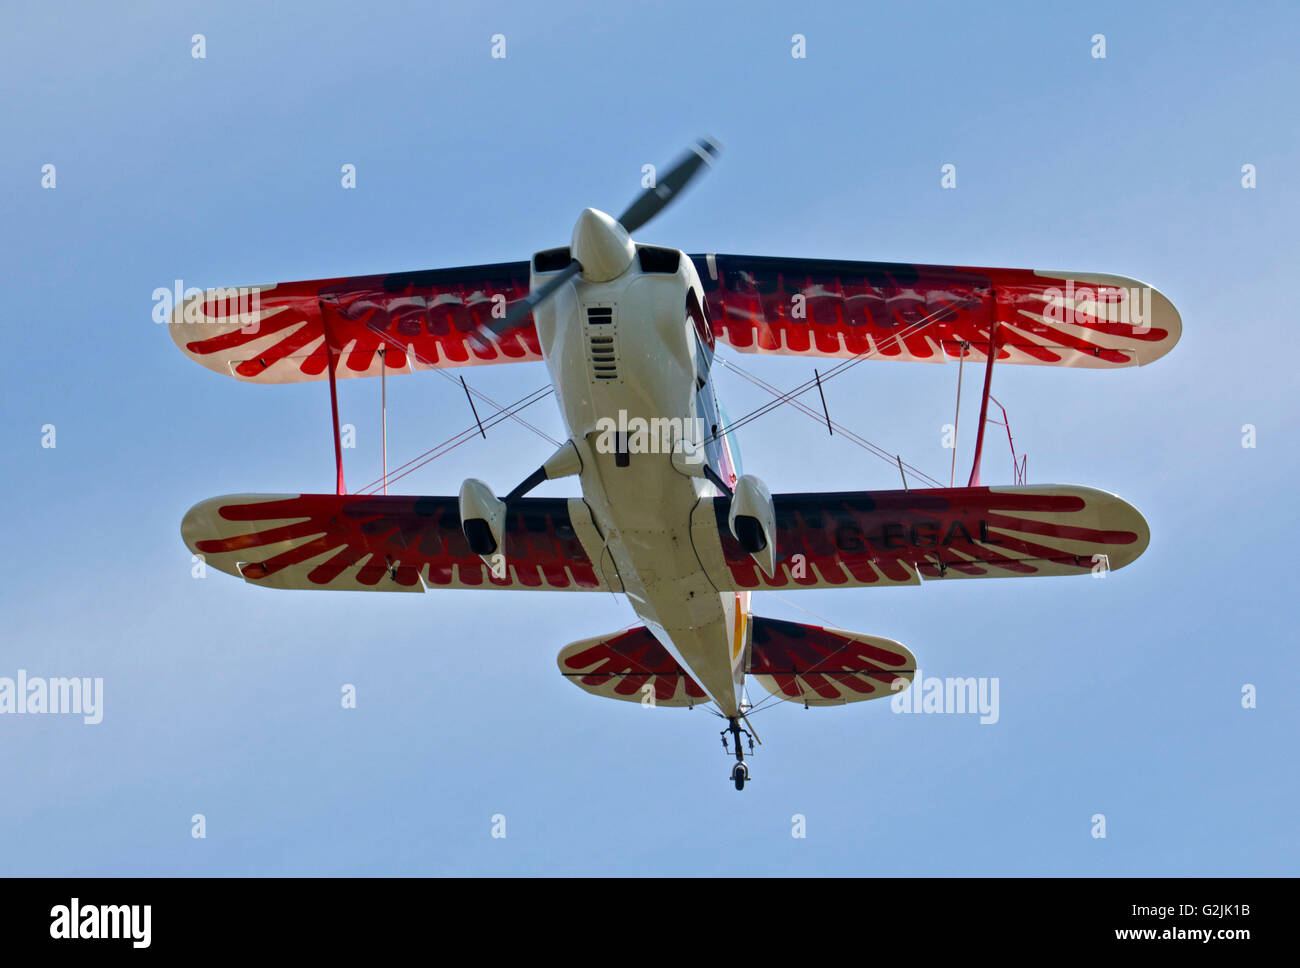 Chisten Eagle II Doppeldecker, Goodwood Aerodrome, West Sussex, England Stockbild